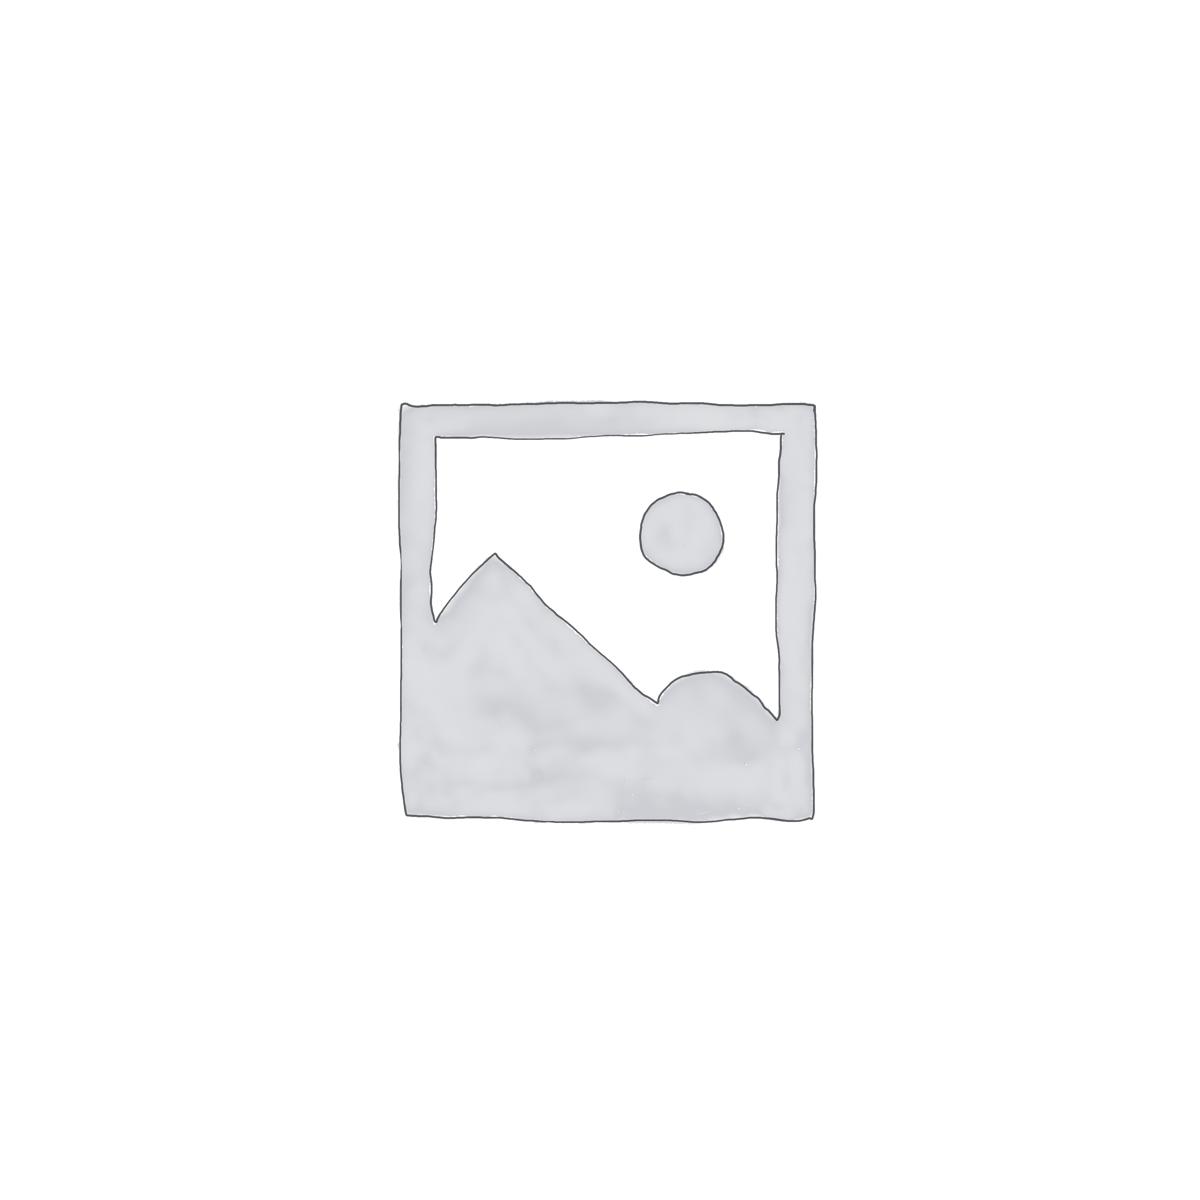 Gearskin™ COMPACT